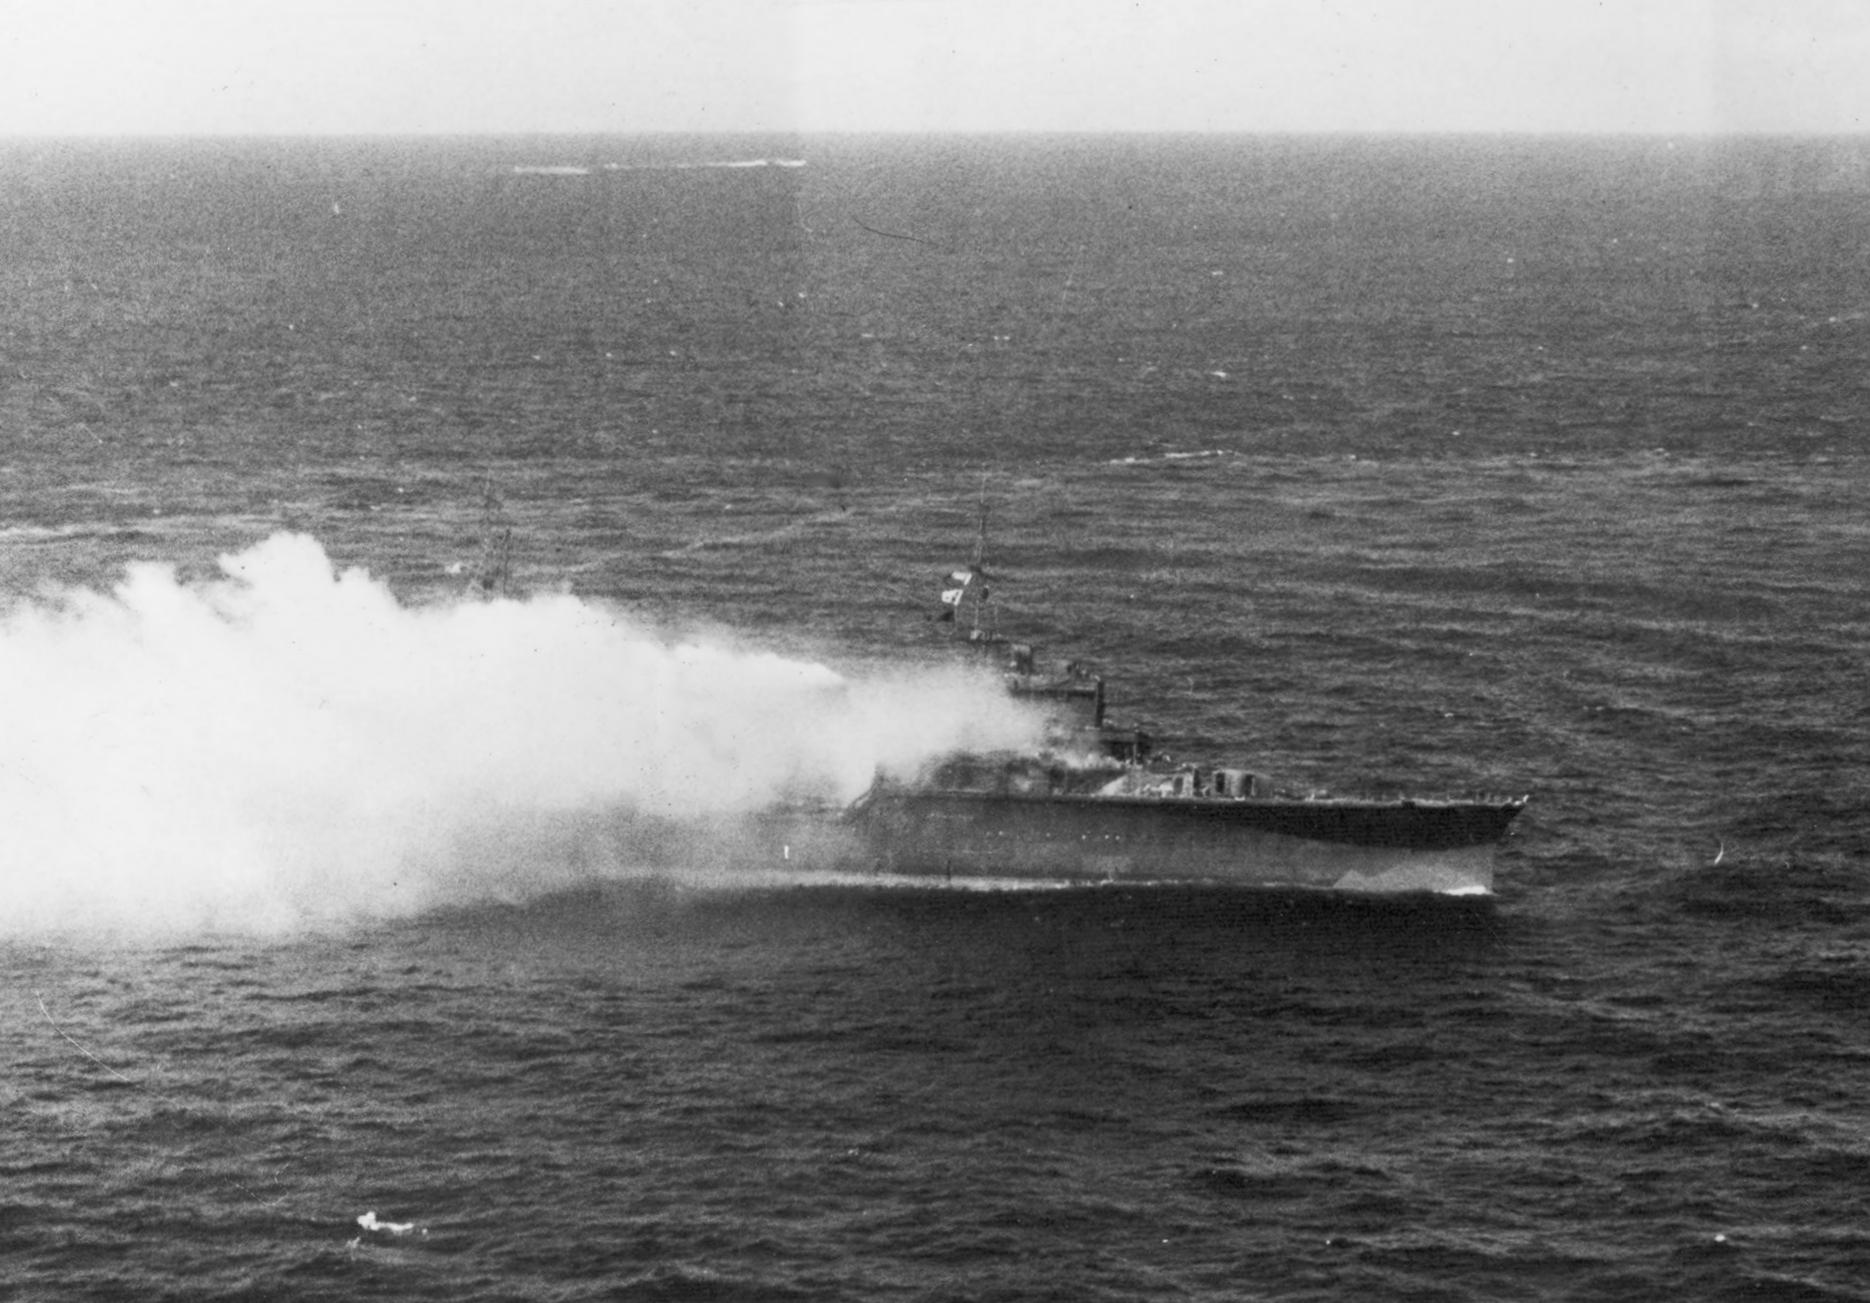 Japanese_light_cruiser_Katori_burning_of